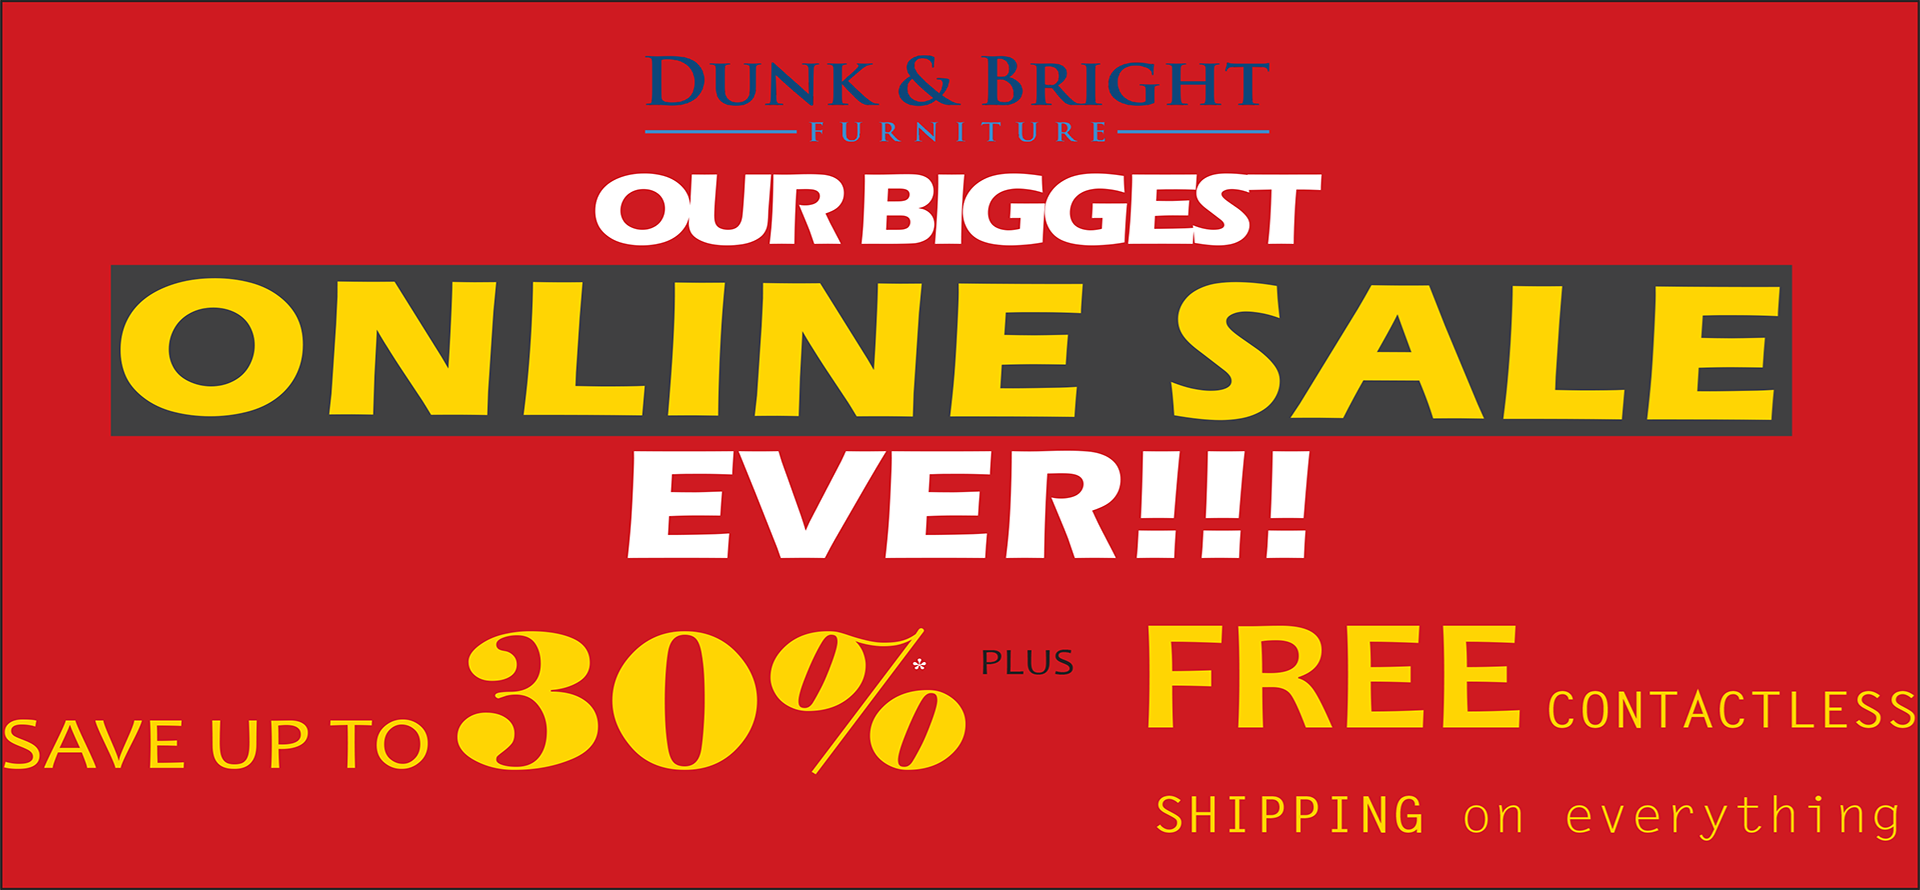 Biggest Online Sale Ever